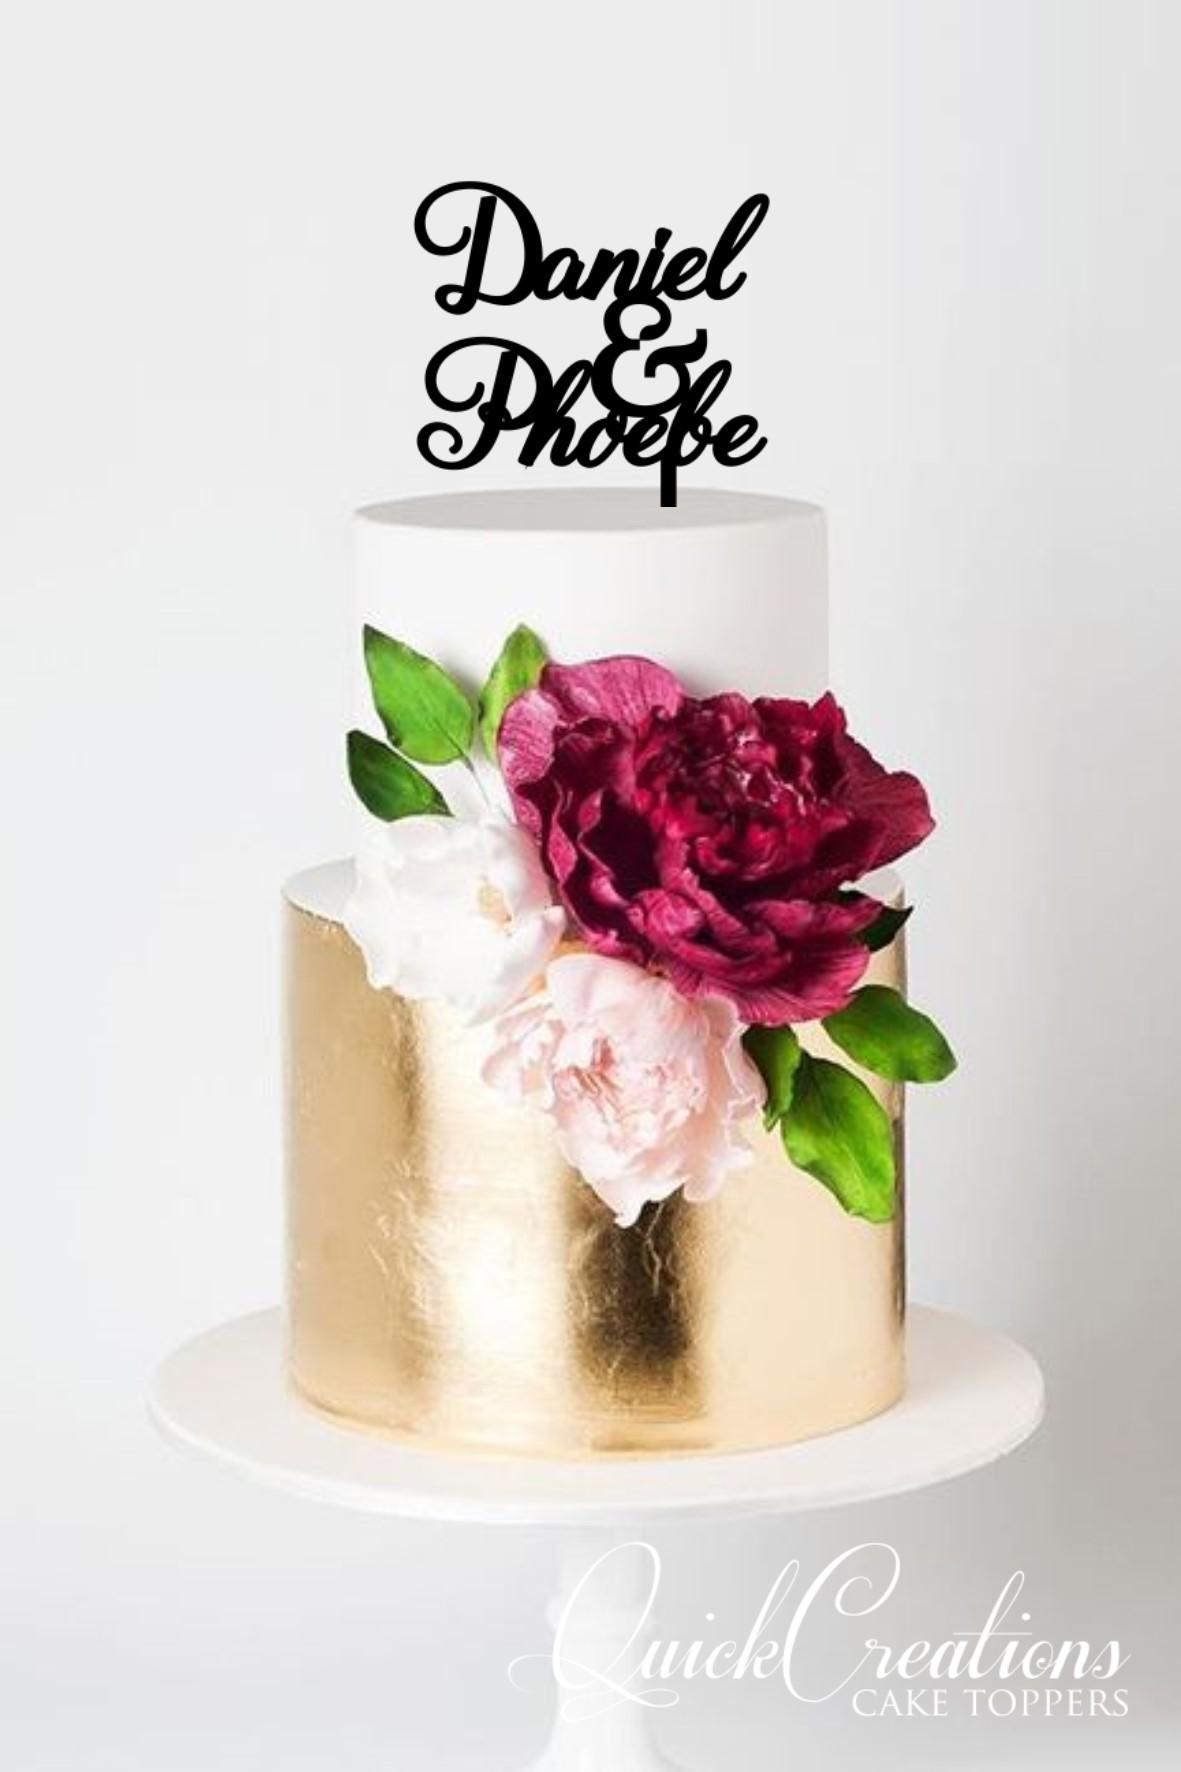 Quick Creations Cake Topper - Daniel & Phoebe